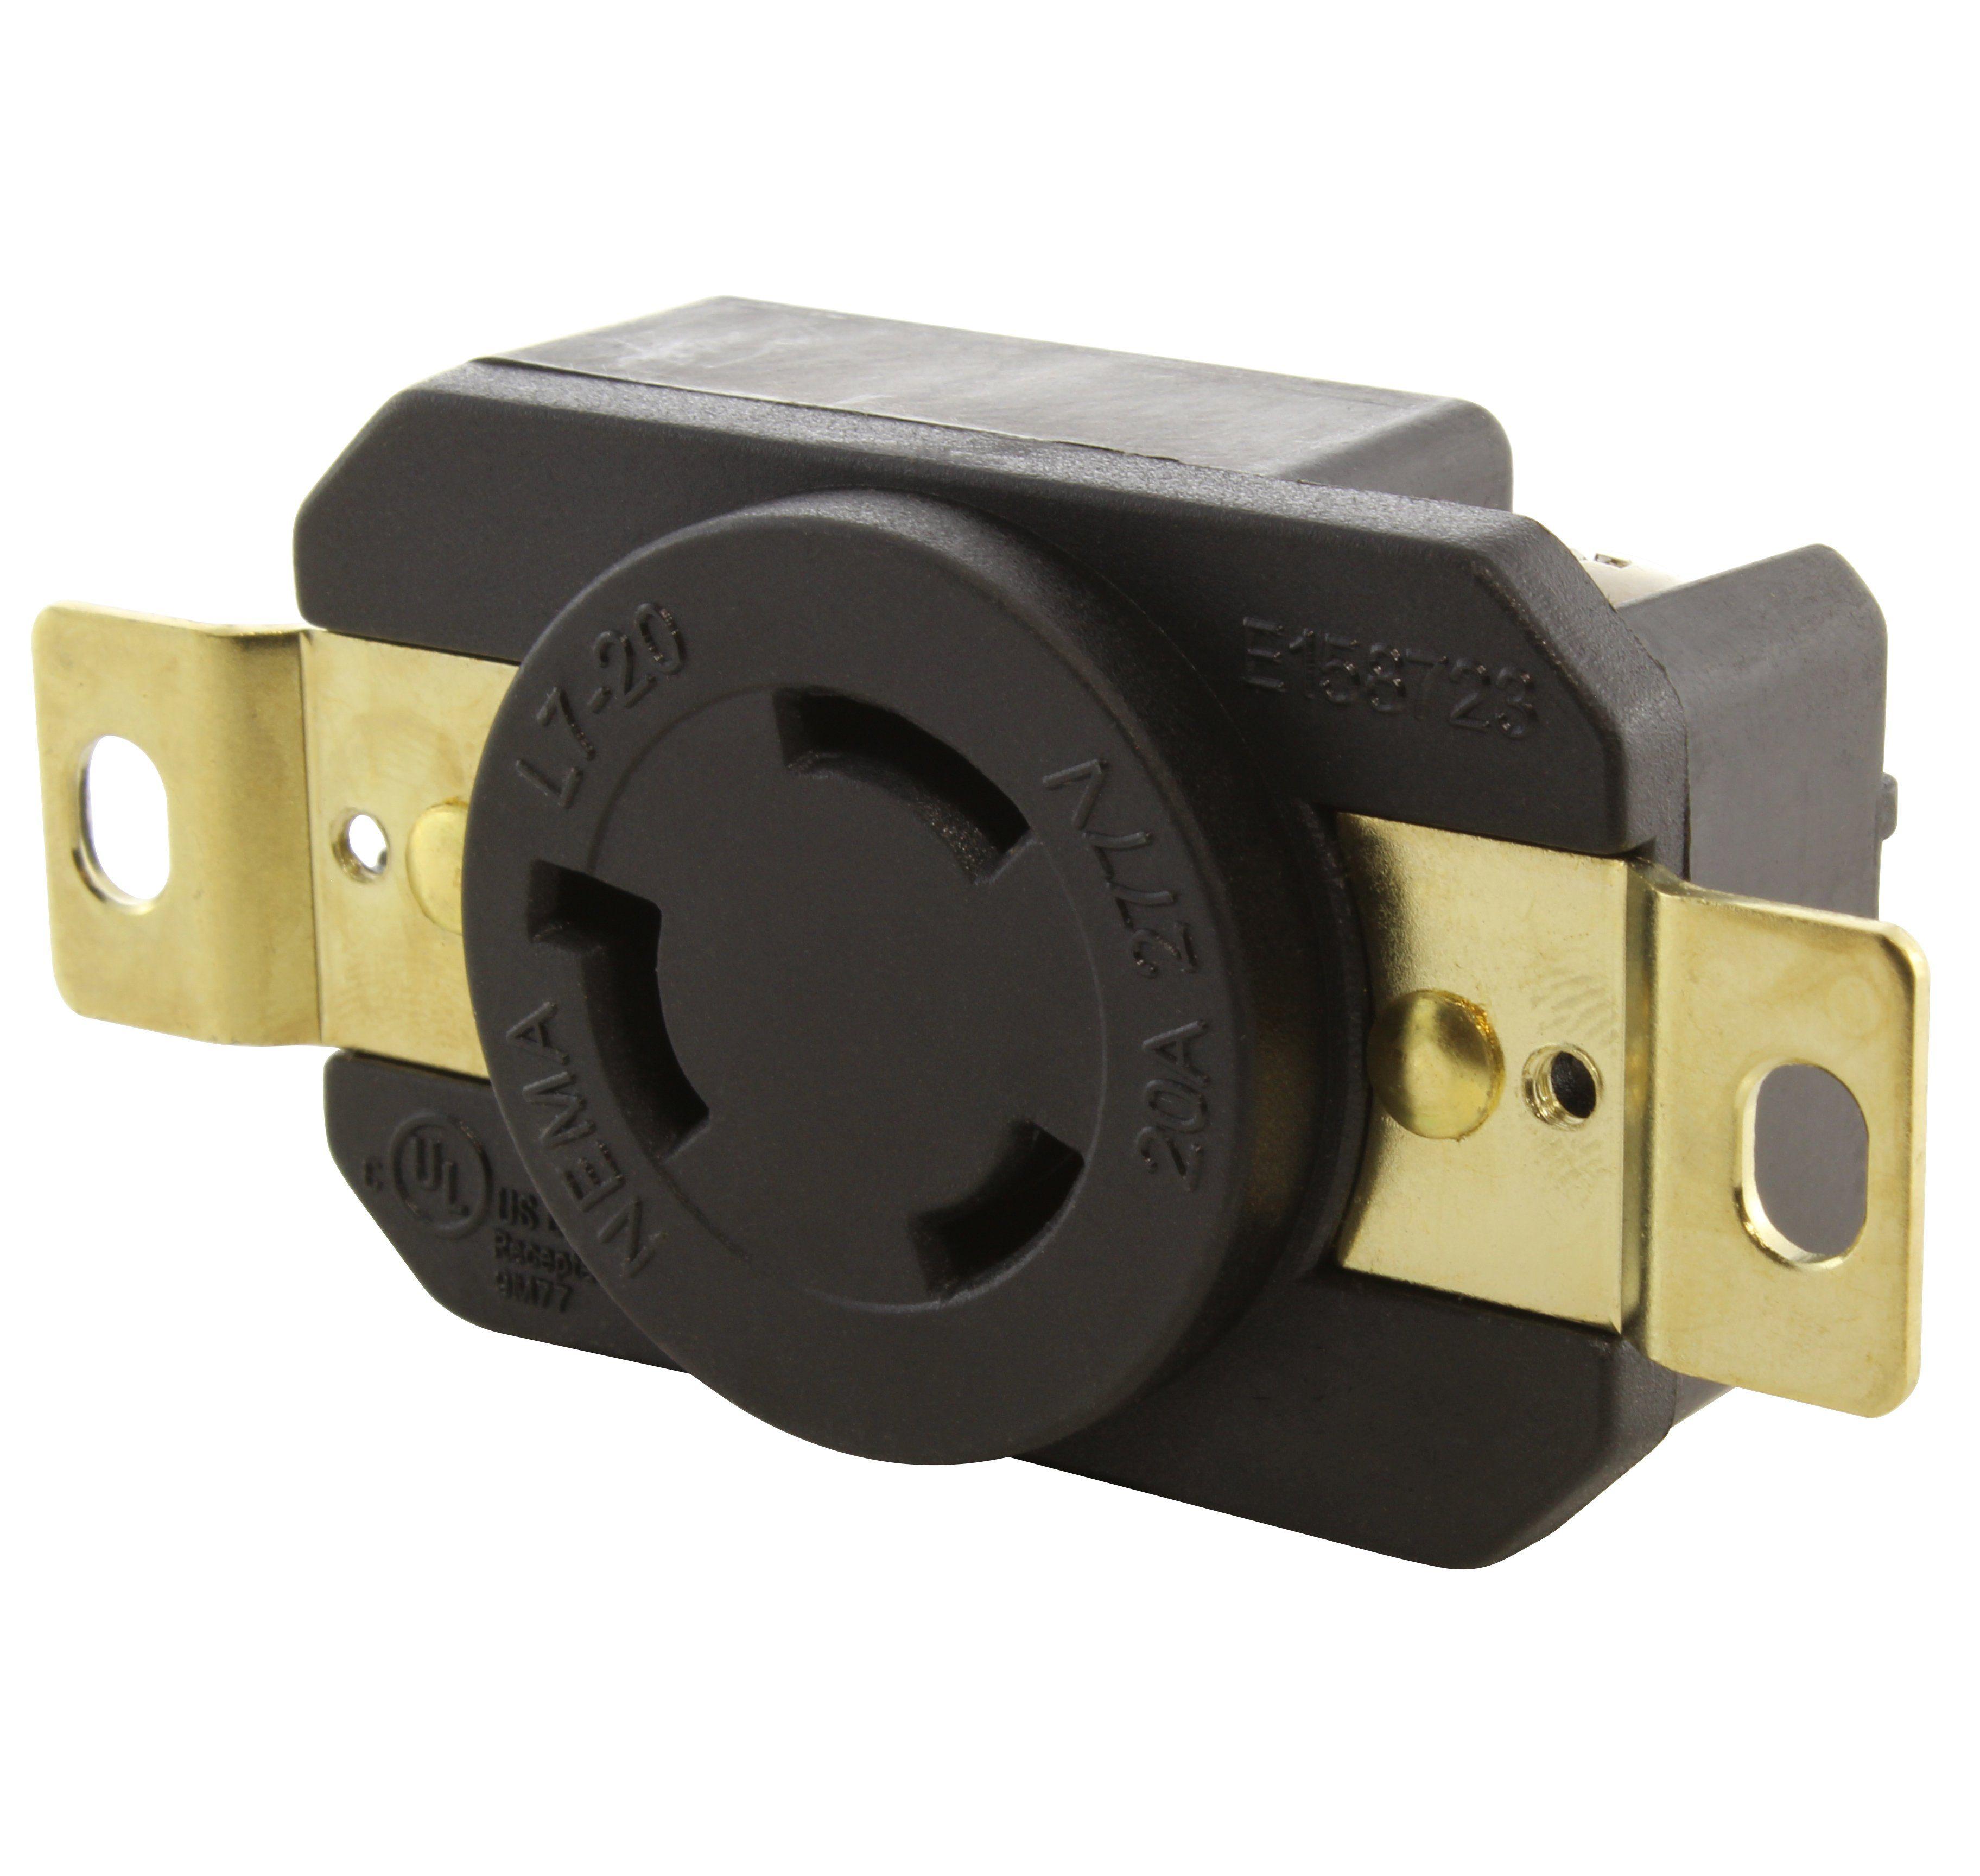 3-48V LCD Digital Electric Circuit Tester Voltage Power Probe Test Detector Z4L9